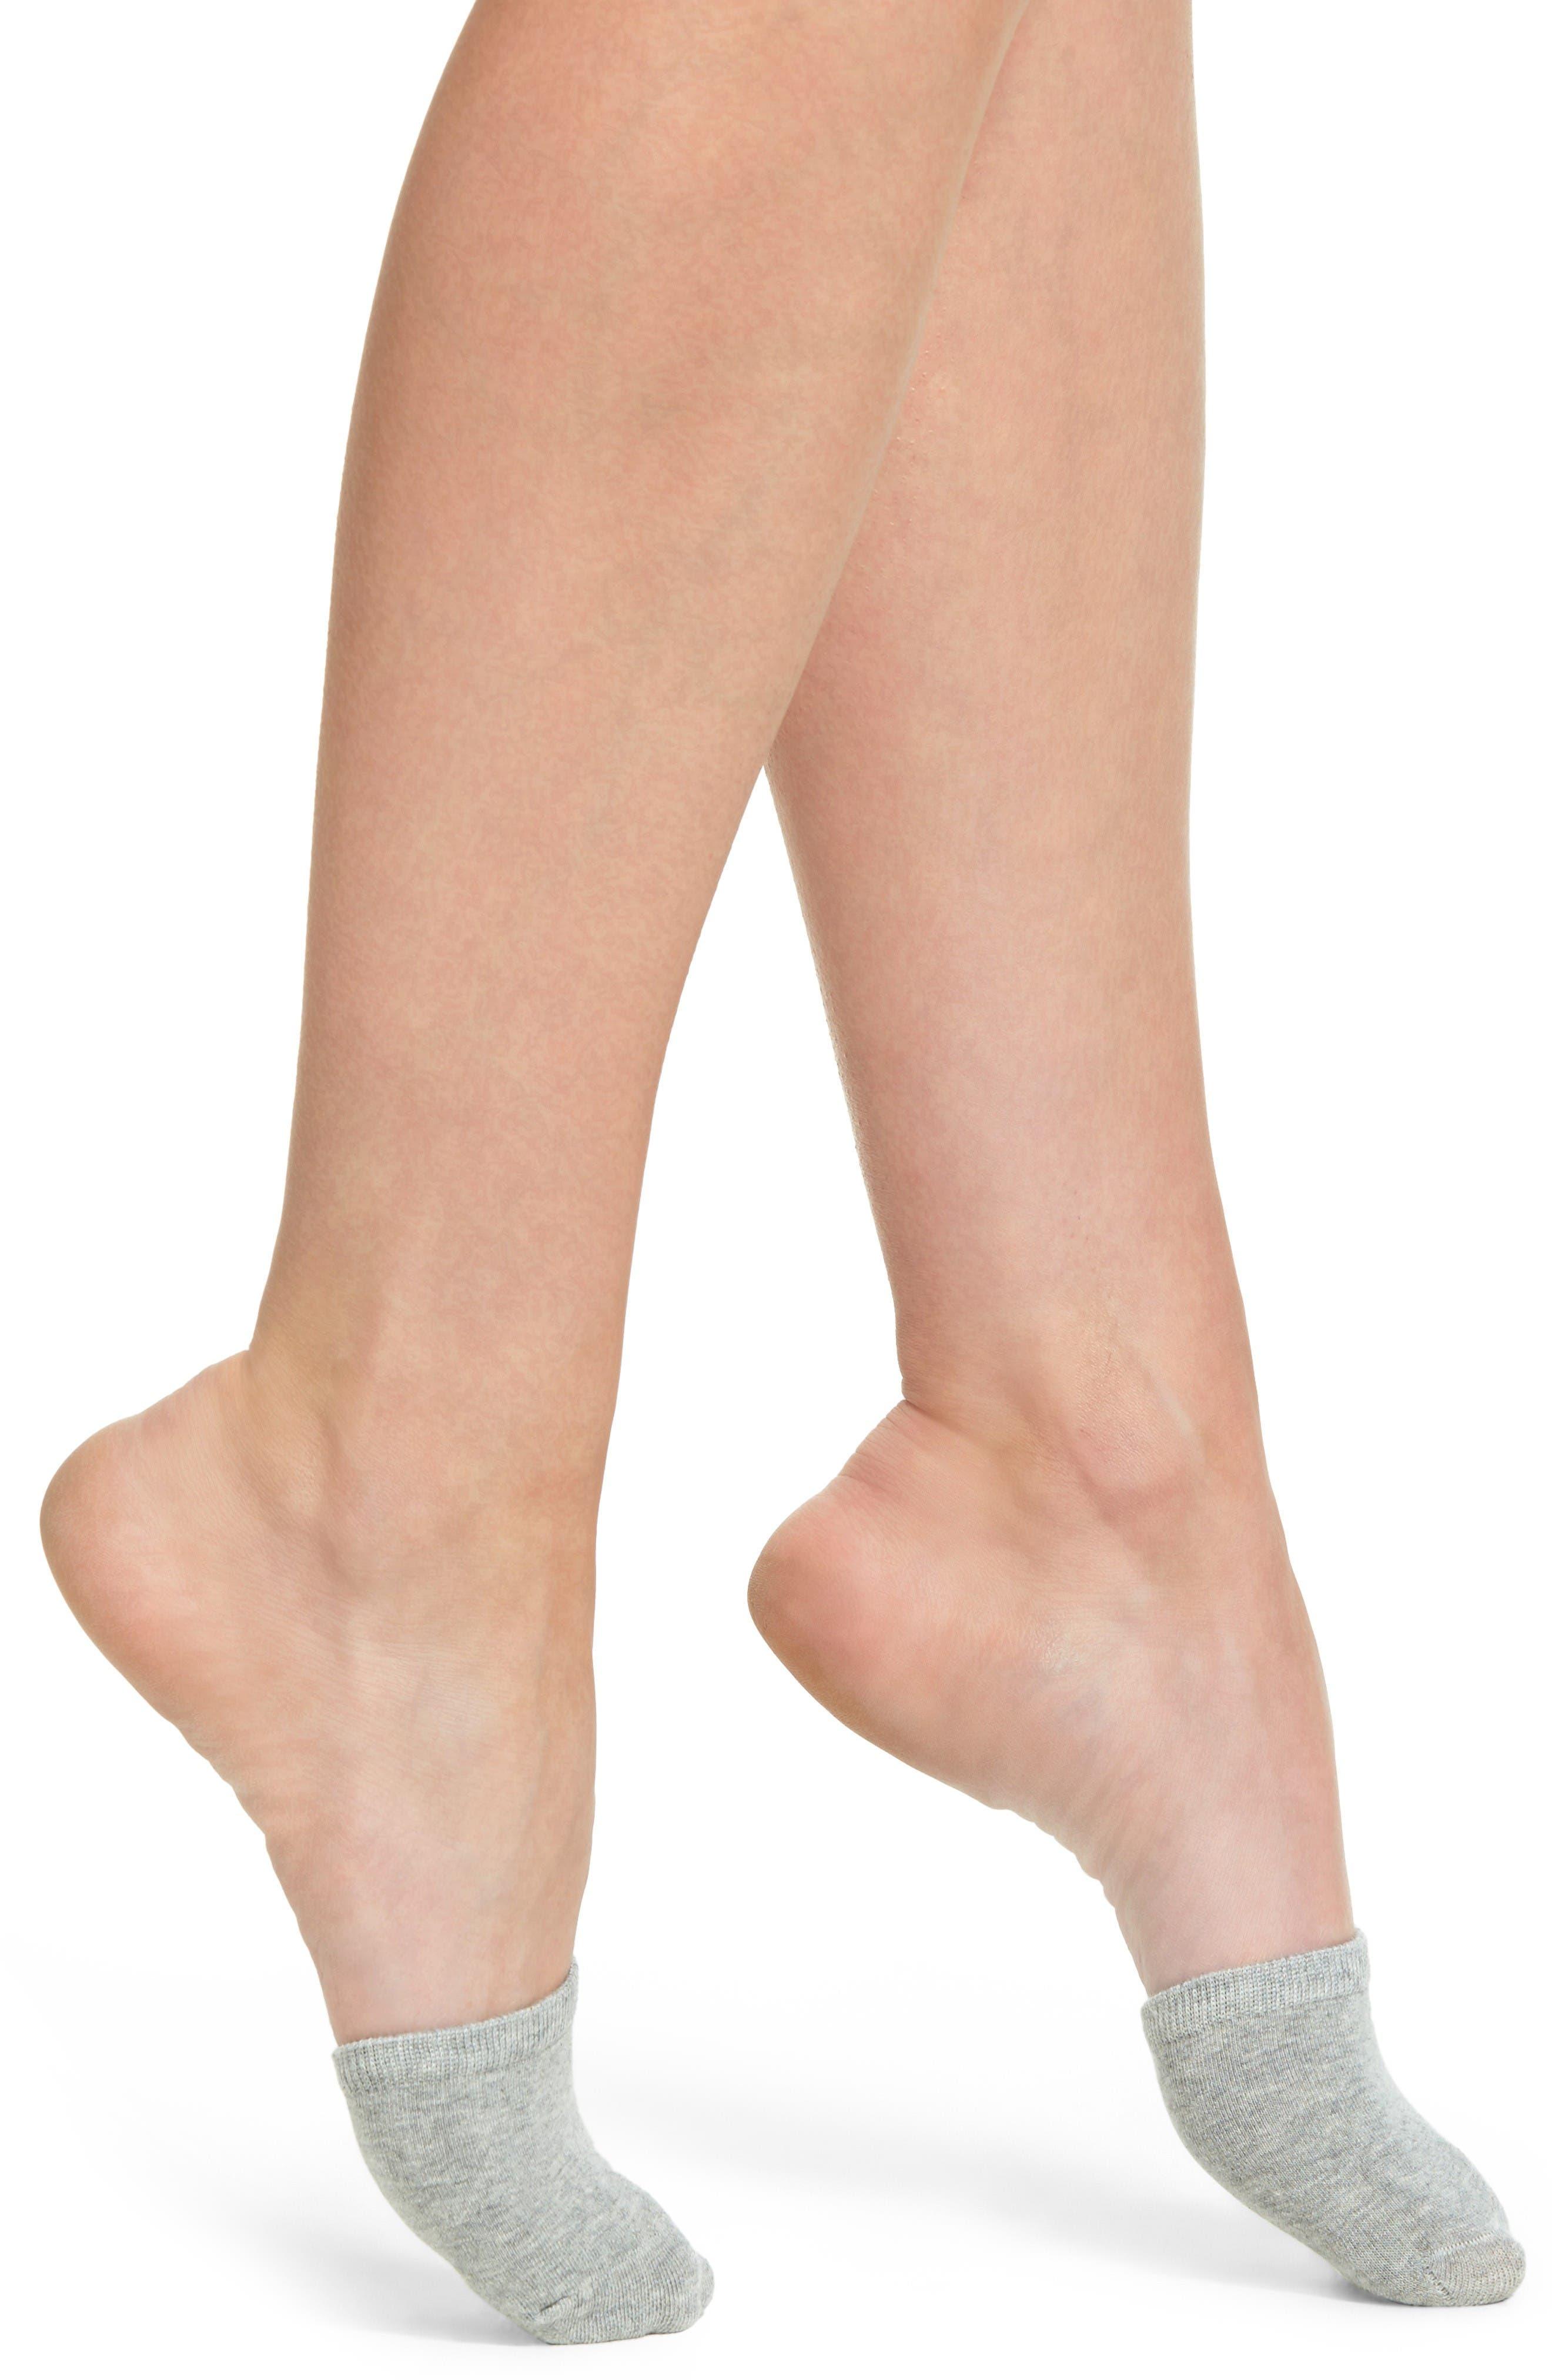 SOCKART 2-Pack Mule Socks